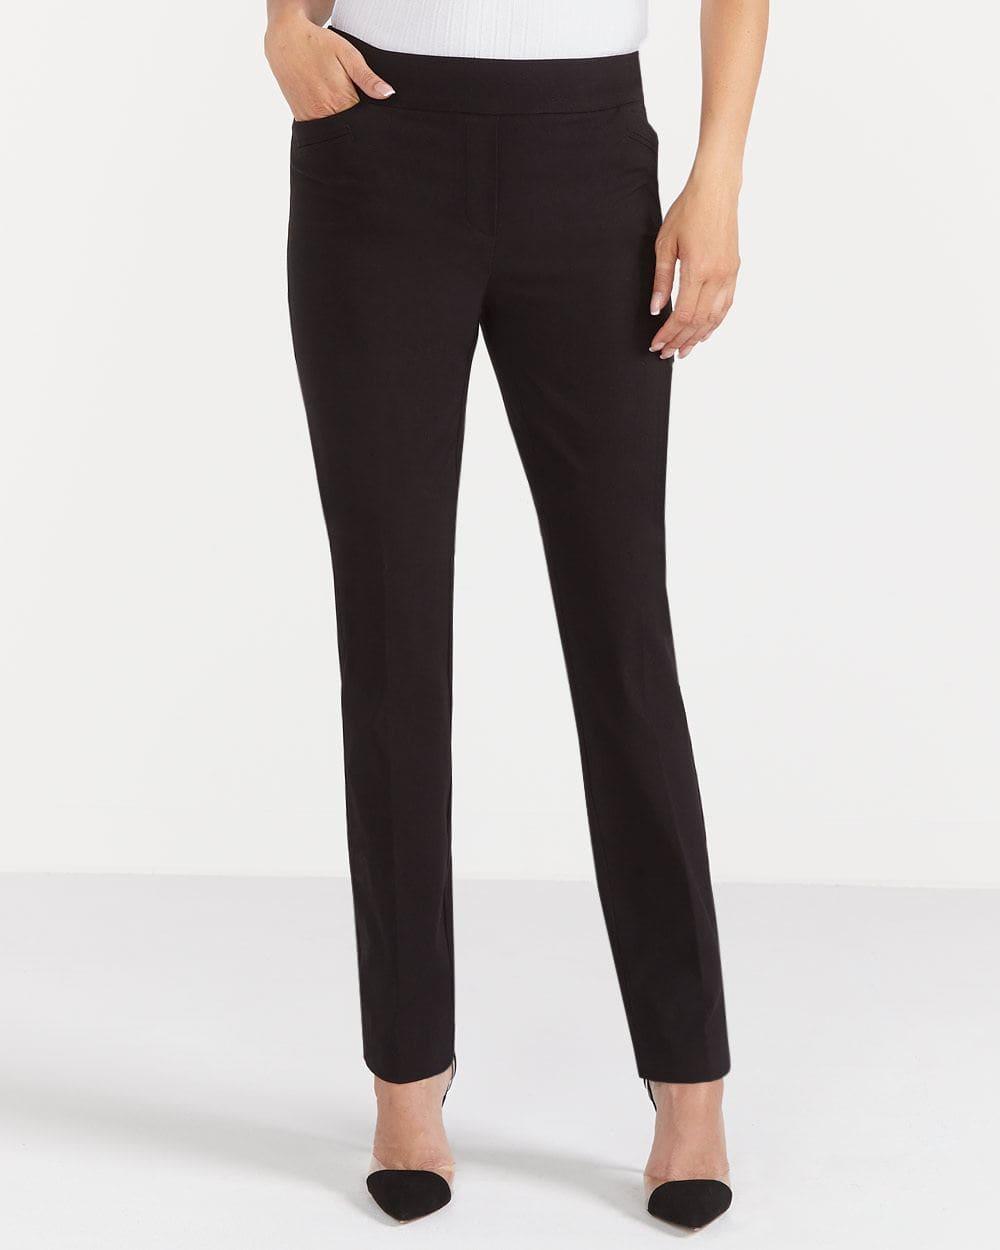 The Tall Iconic Straight Leg Pants